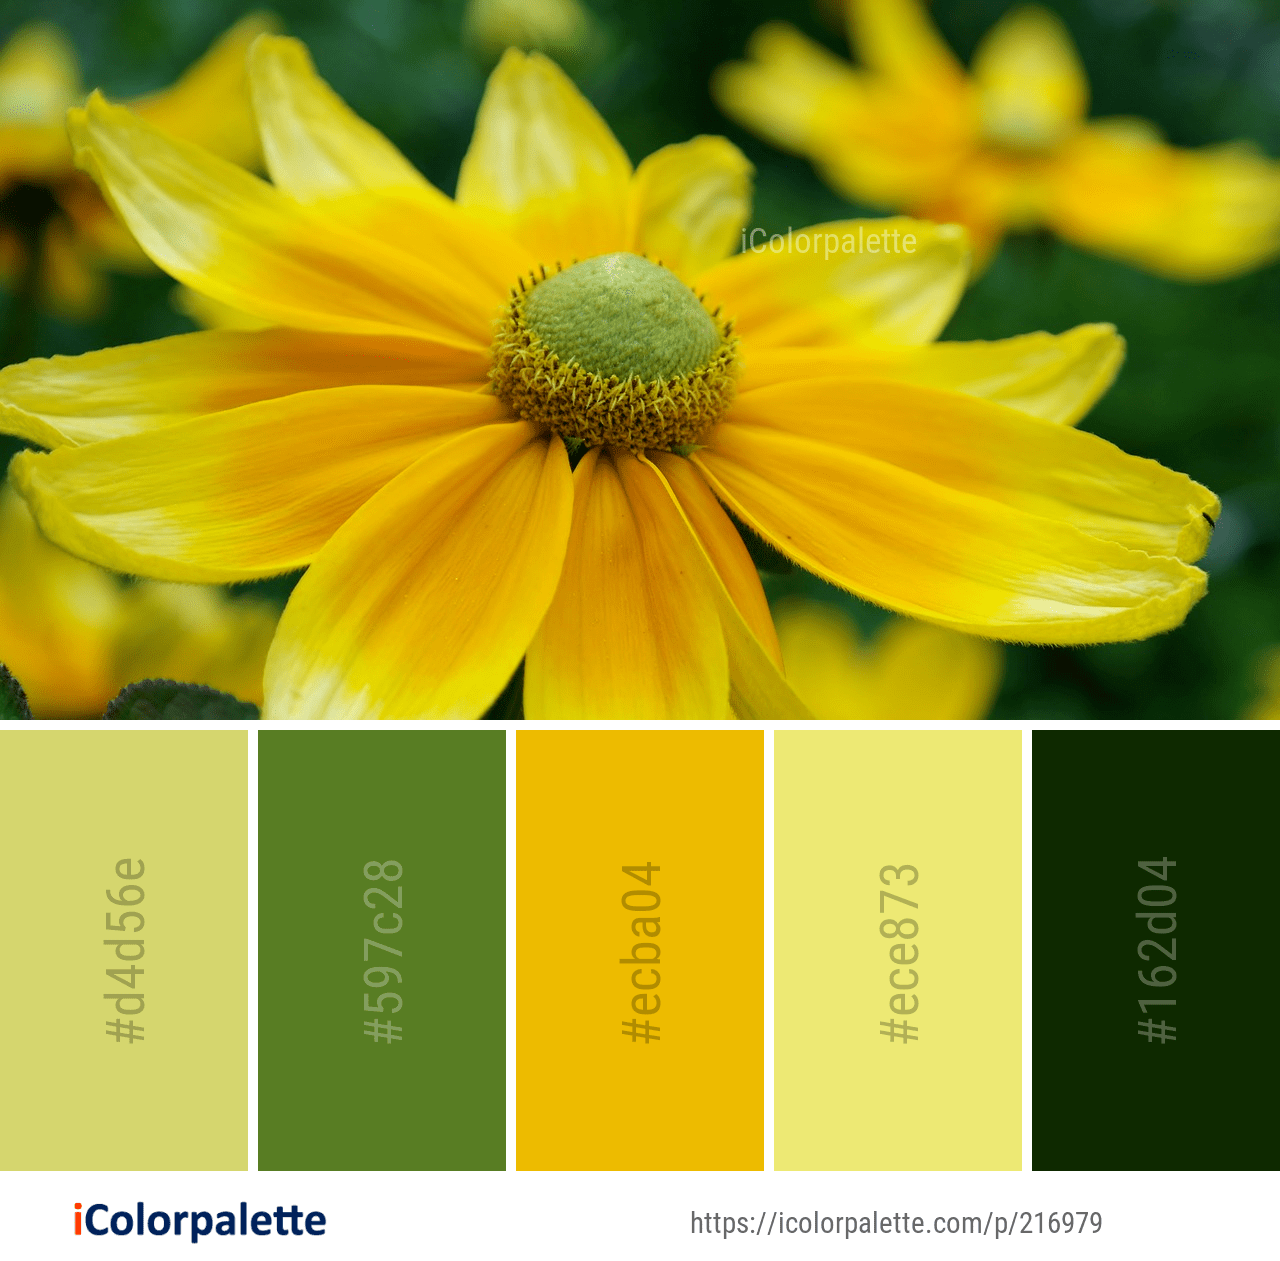 Color Palette Ideas Icolorpalette Colors Inspiration Graphics Design Inspiration Beautiful Colorpalette Color Palette Yellow Color Palette Color Mixing